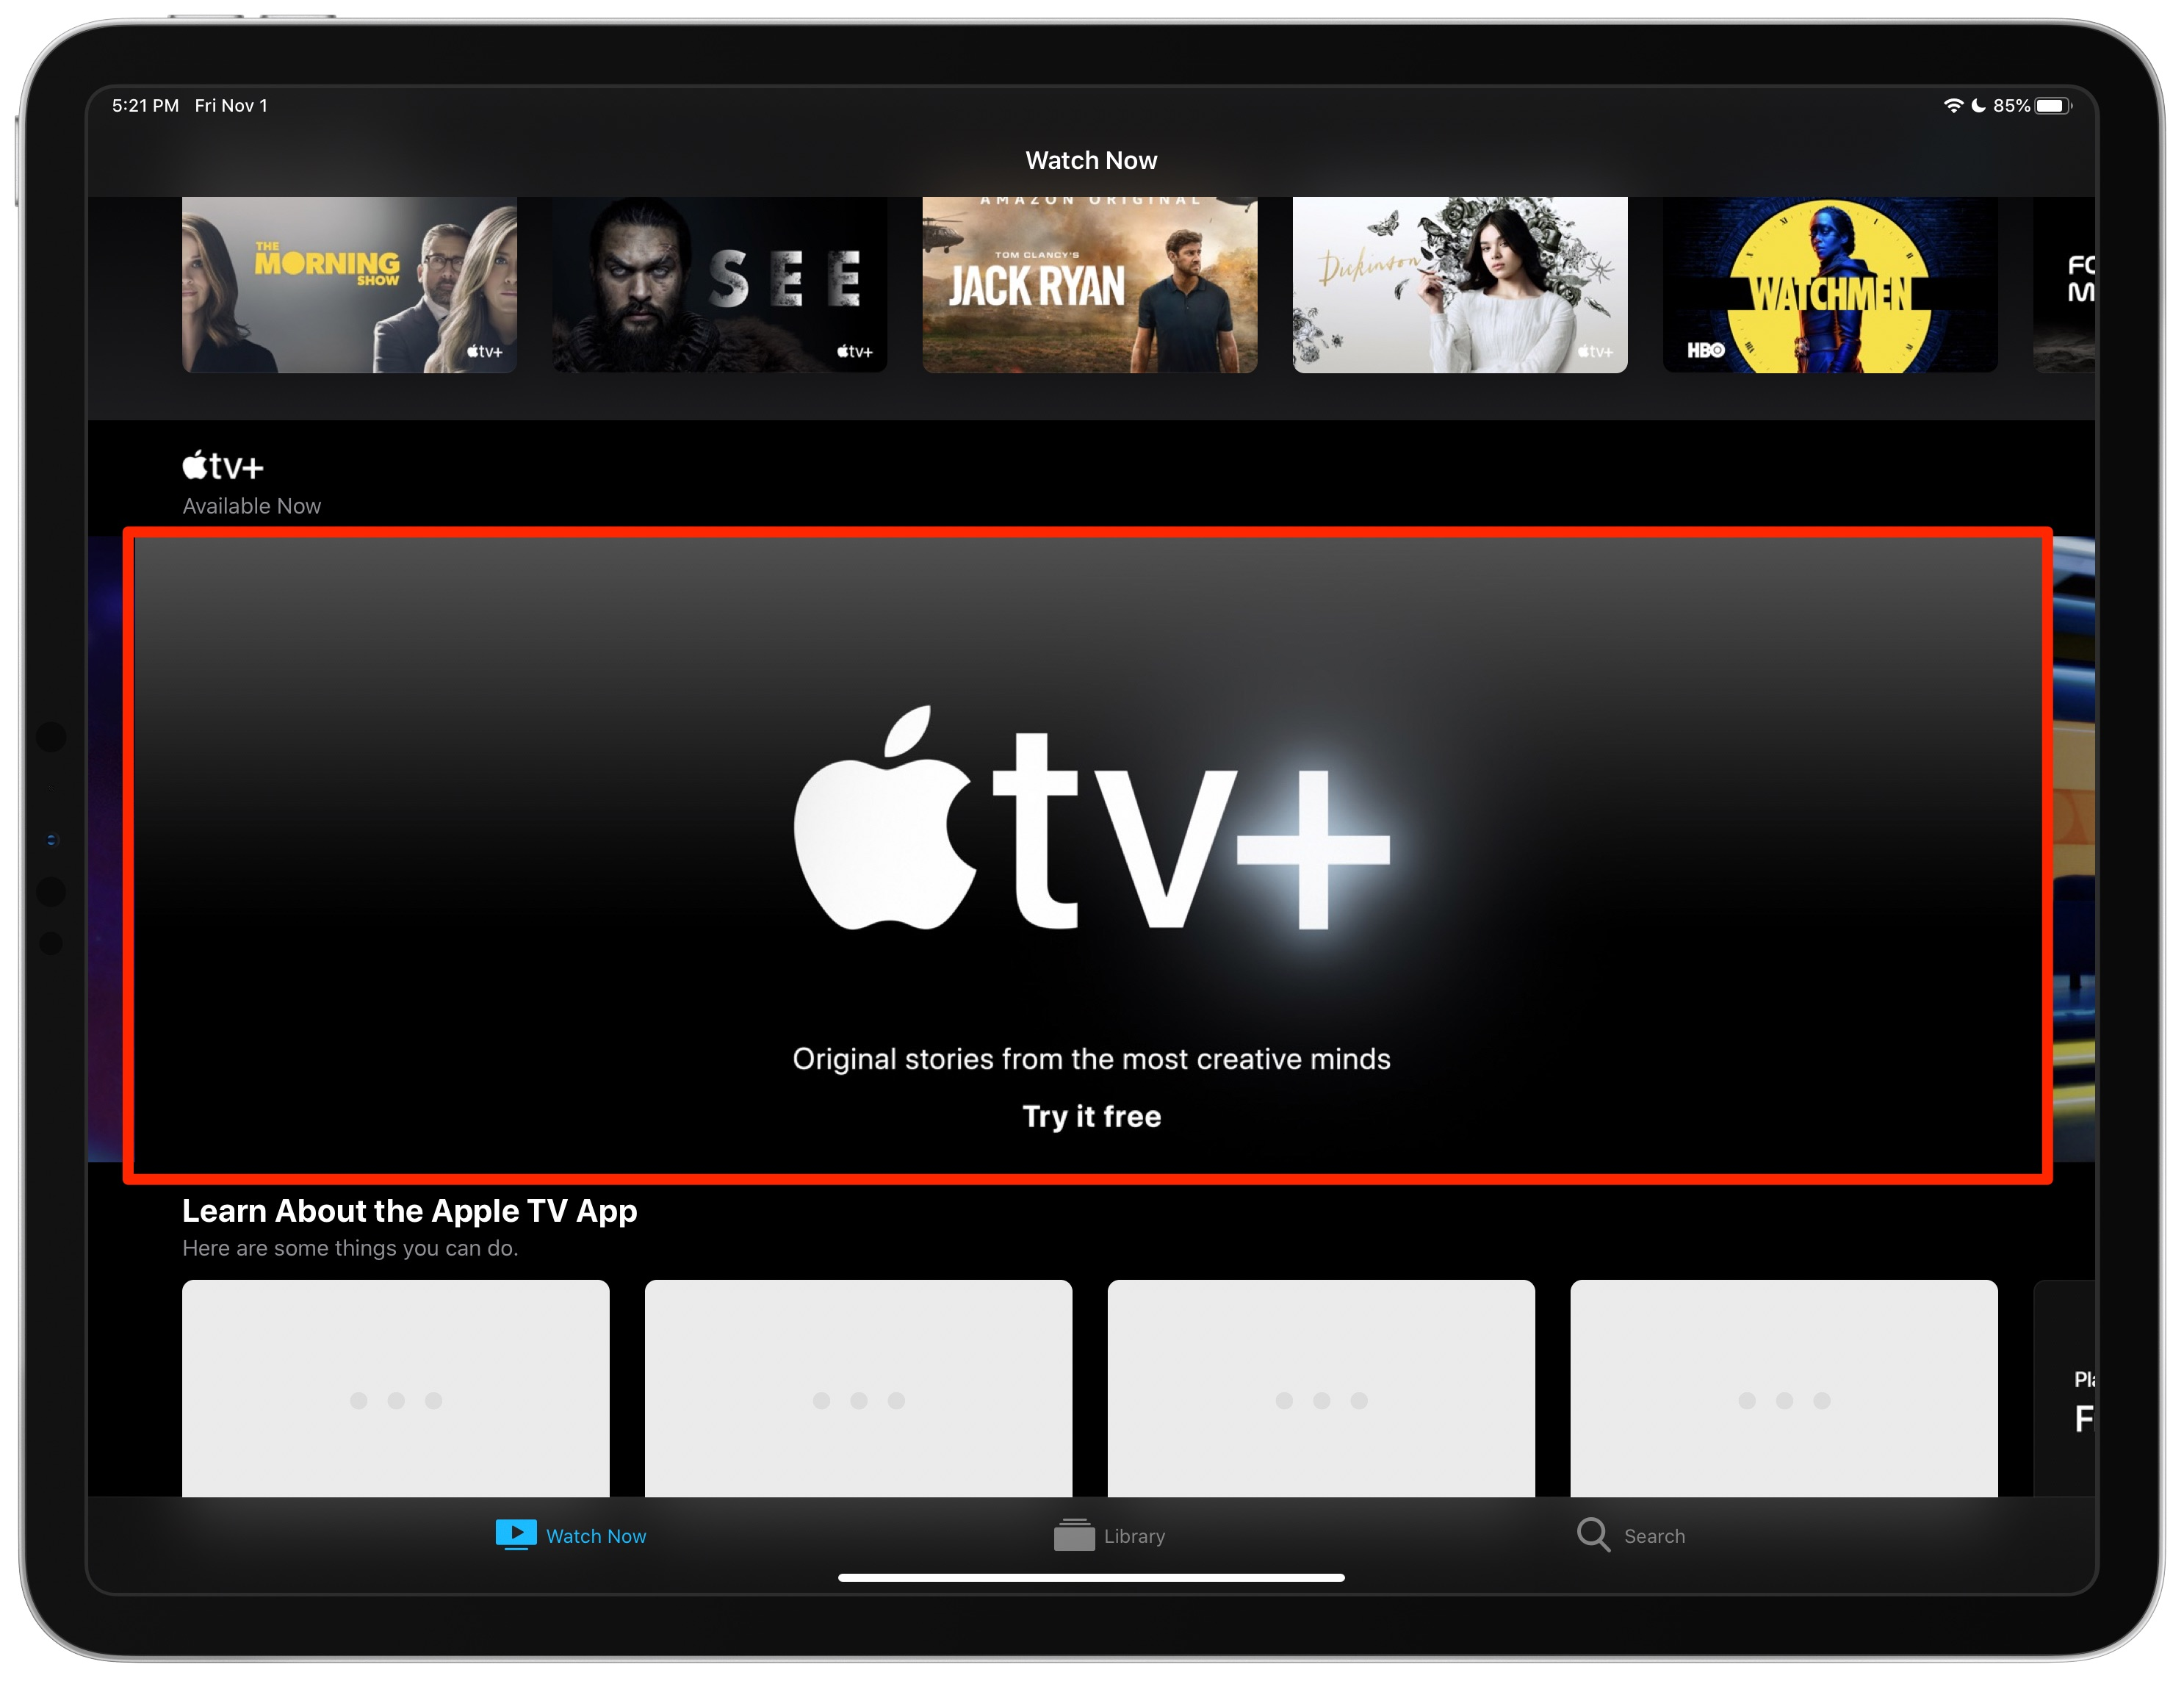 +Apple TV